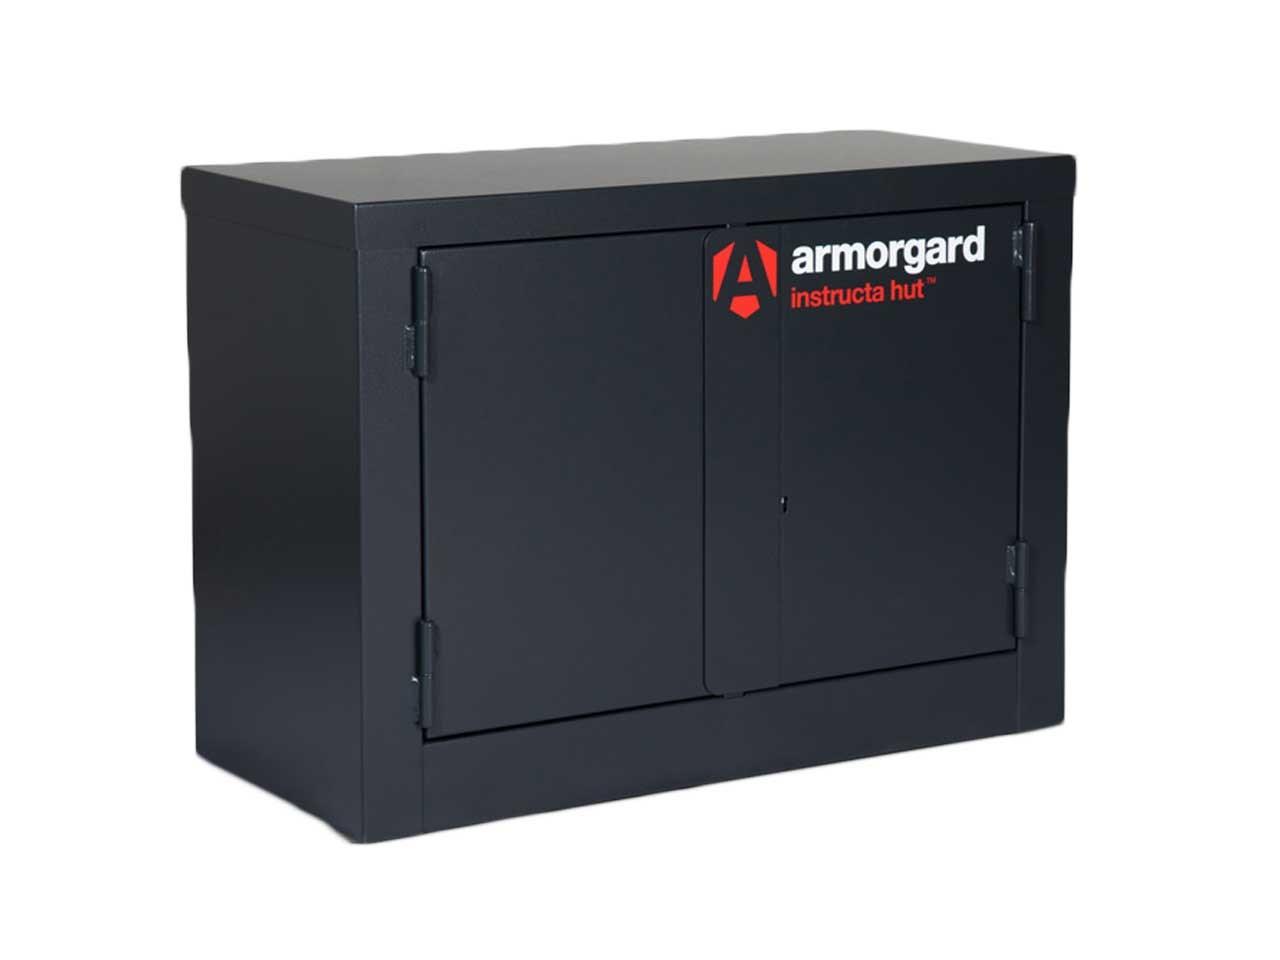 Armorgard Instructahut Cabinet Instructahut Ih4 Ppe